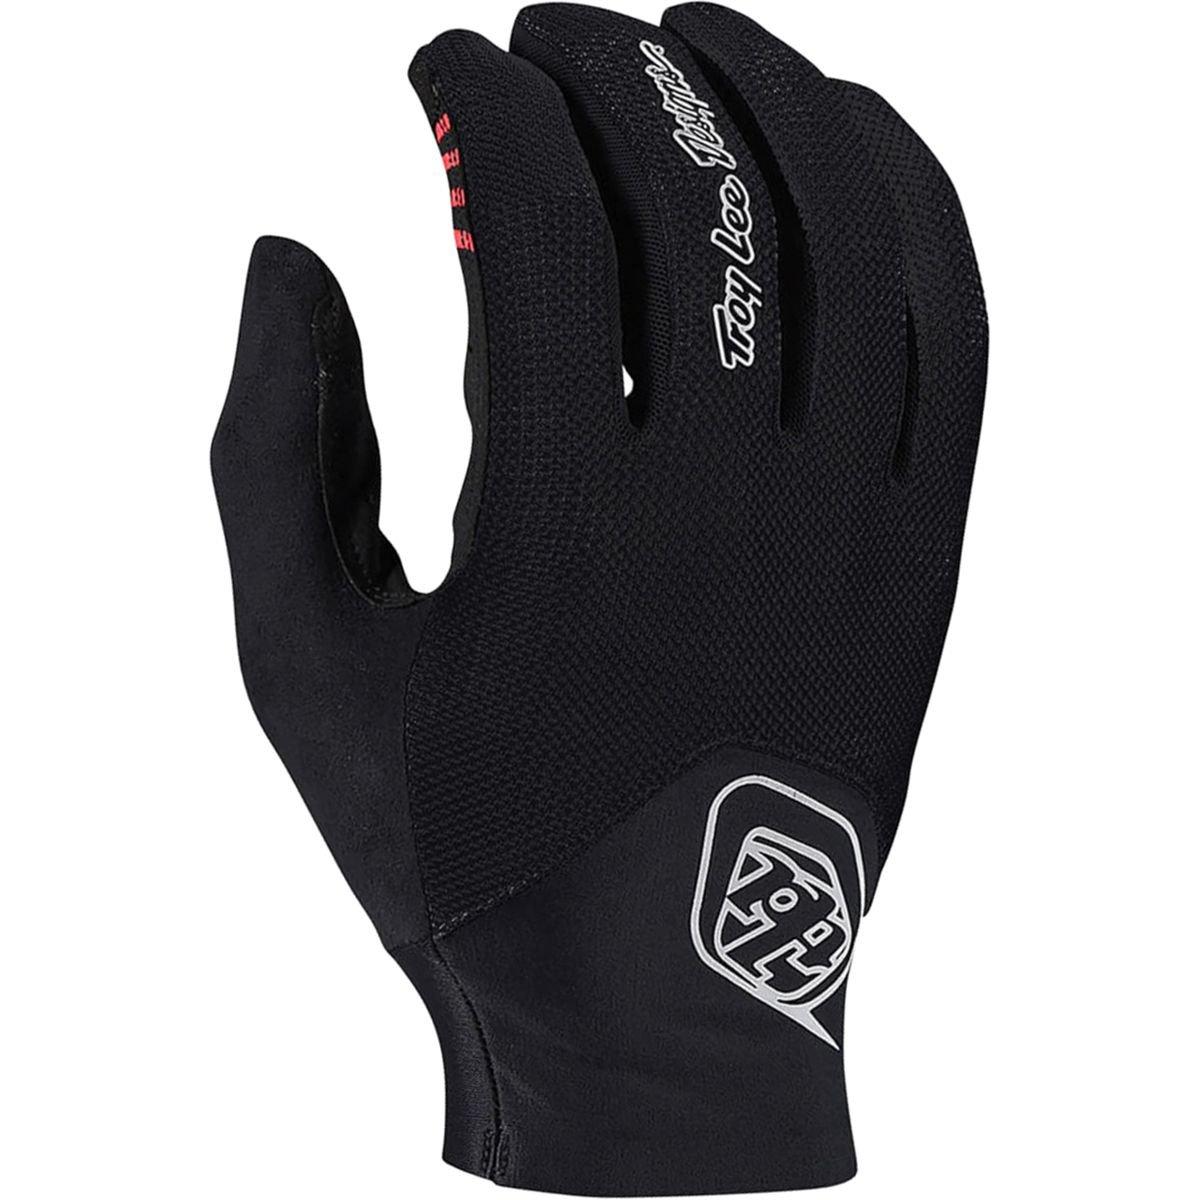 Troy Lee Designs Handschuhe Ace 2.0 Schwarz Gr. XL